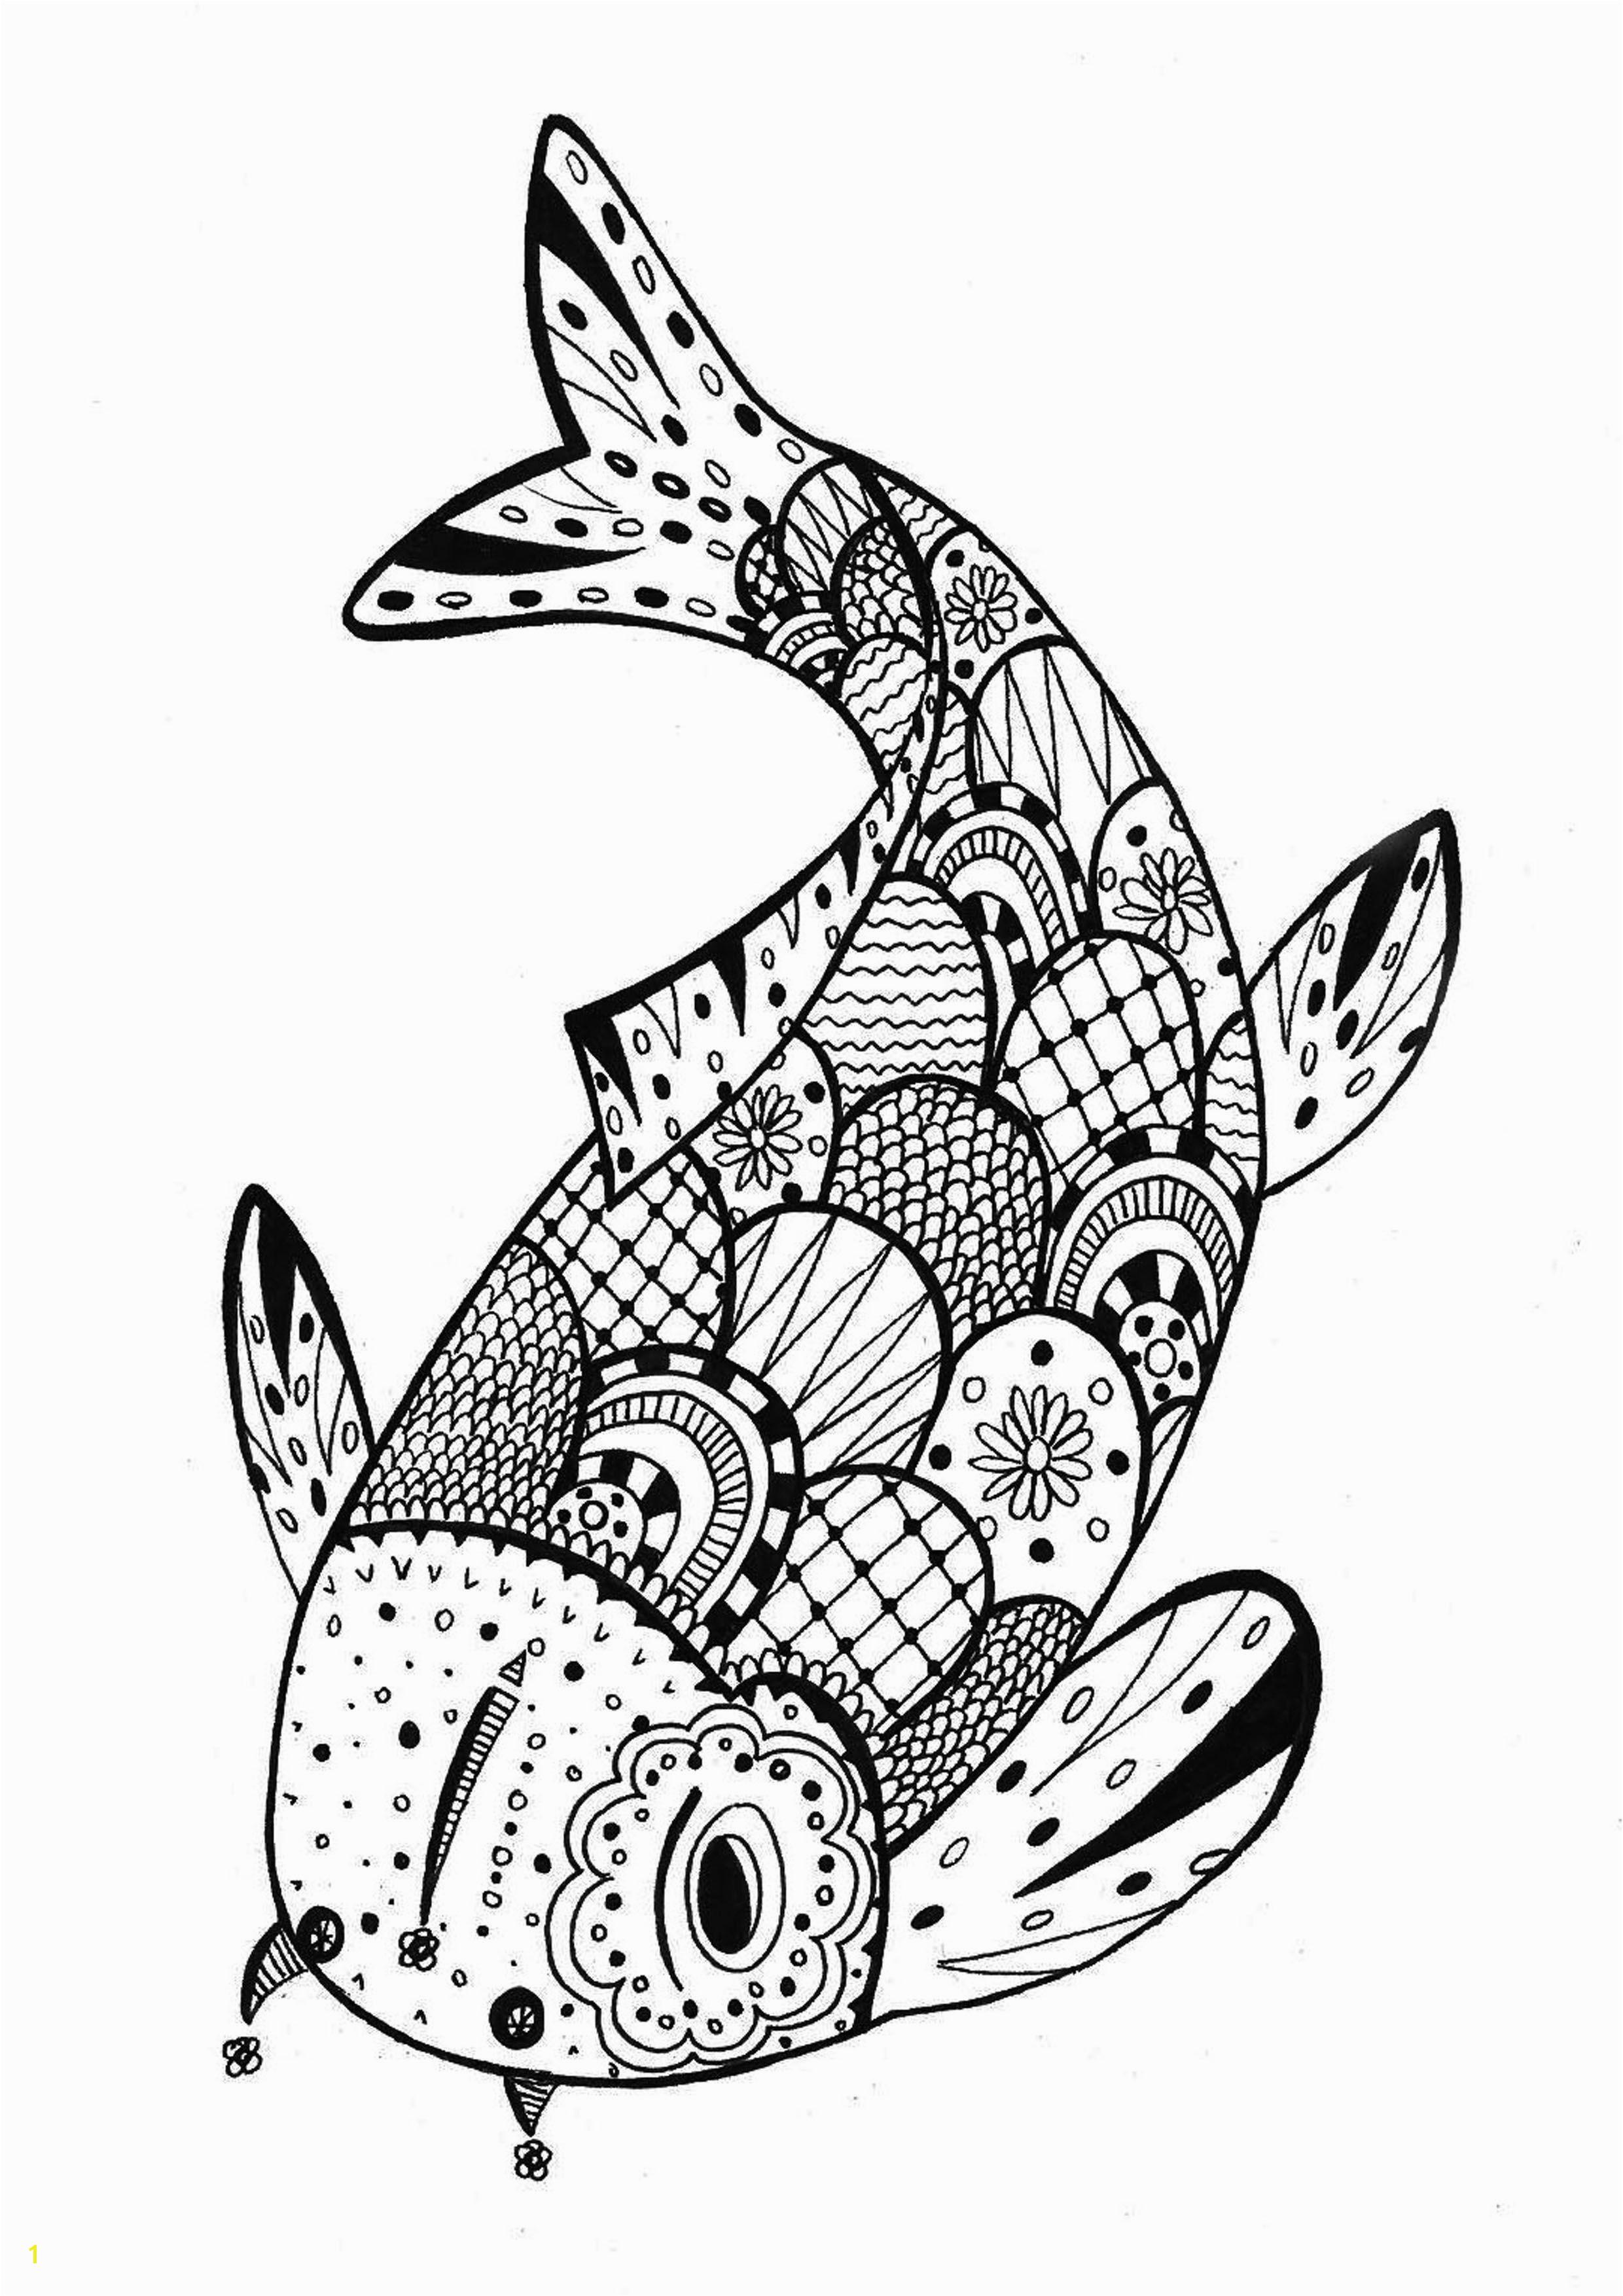 A Fish Coloring Page Fresh Best Fresh S S Media Cache Ak0 Pinimg originals 0d B4 2c